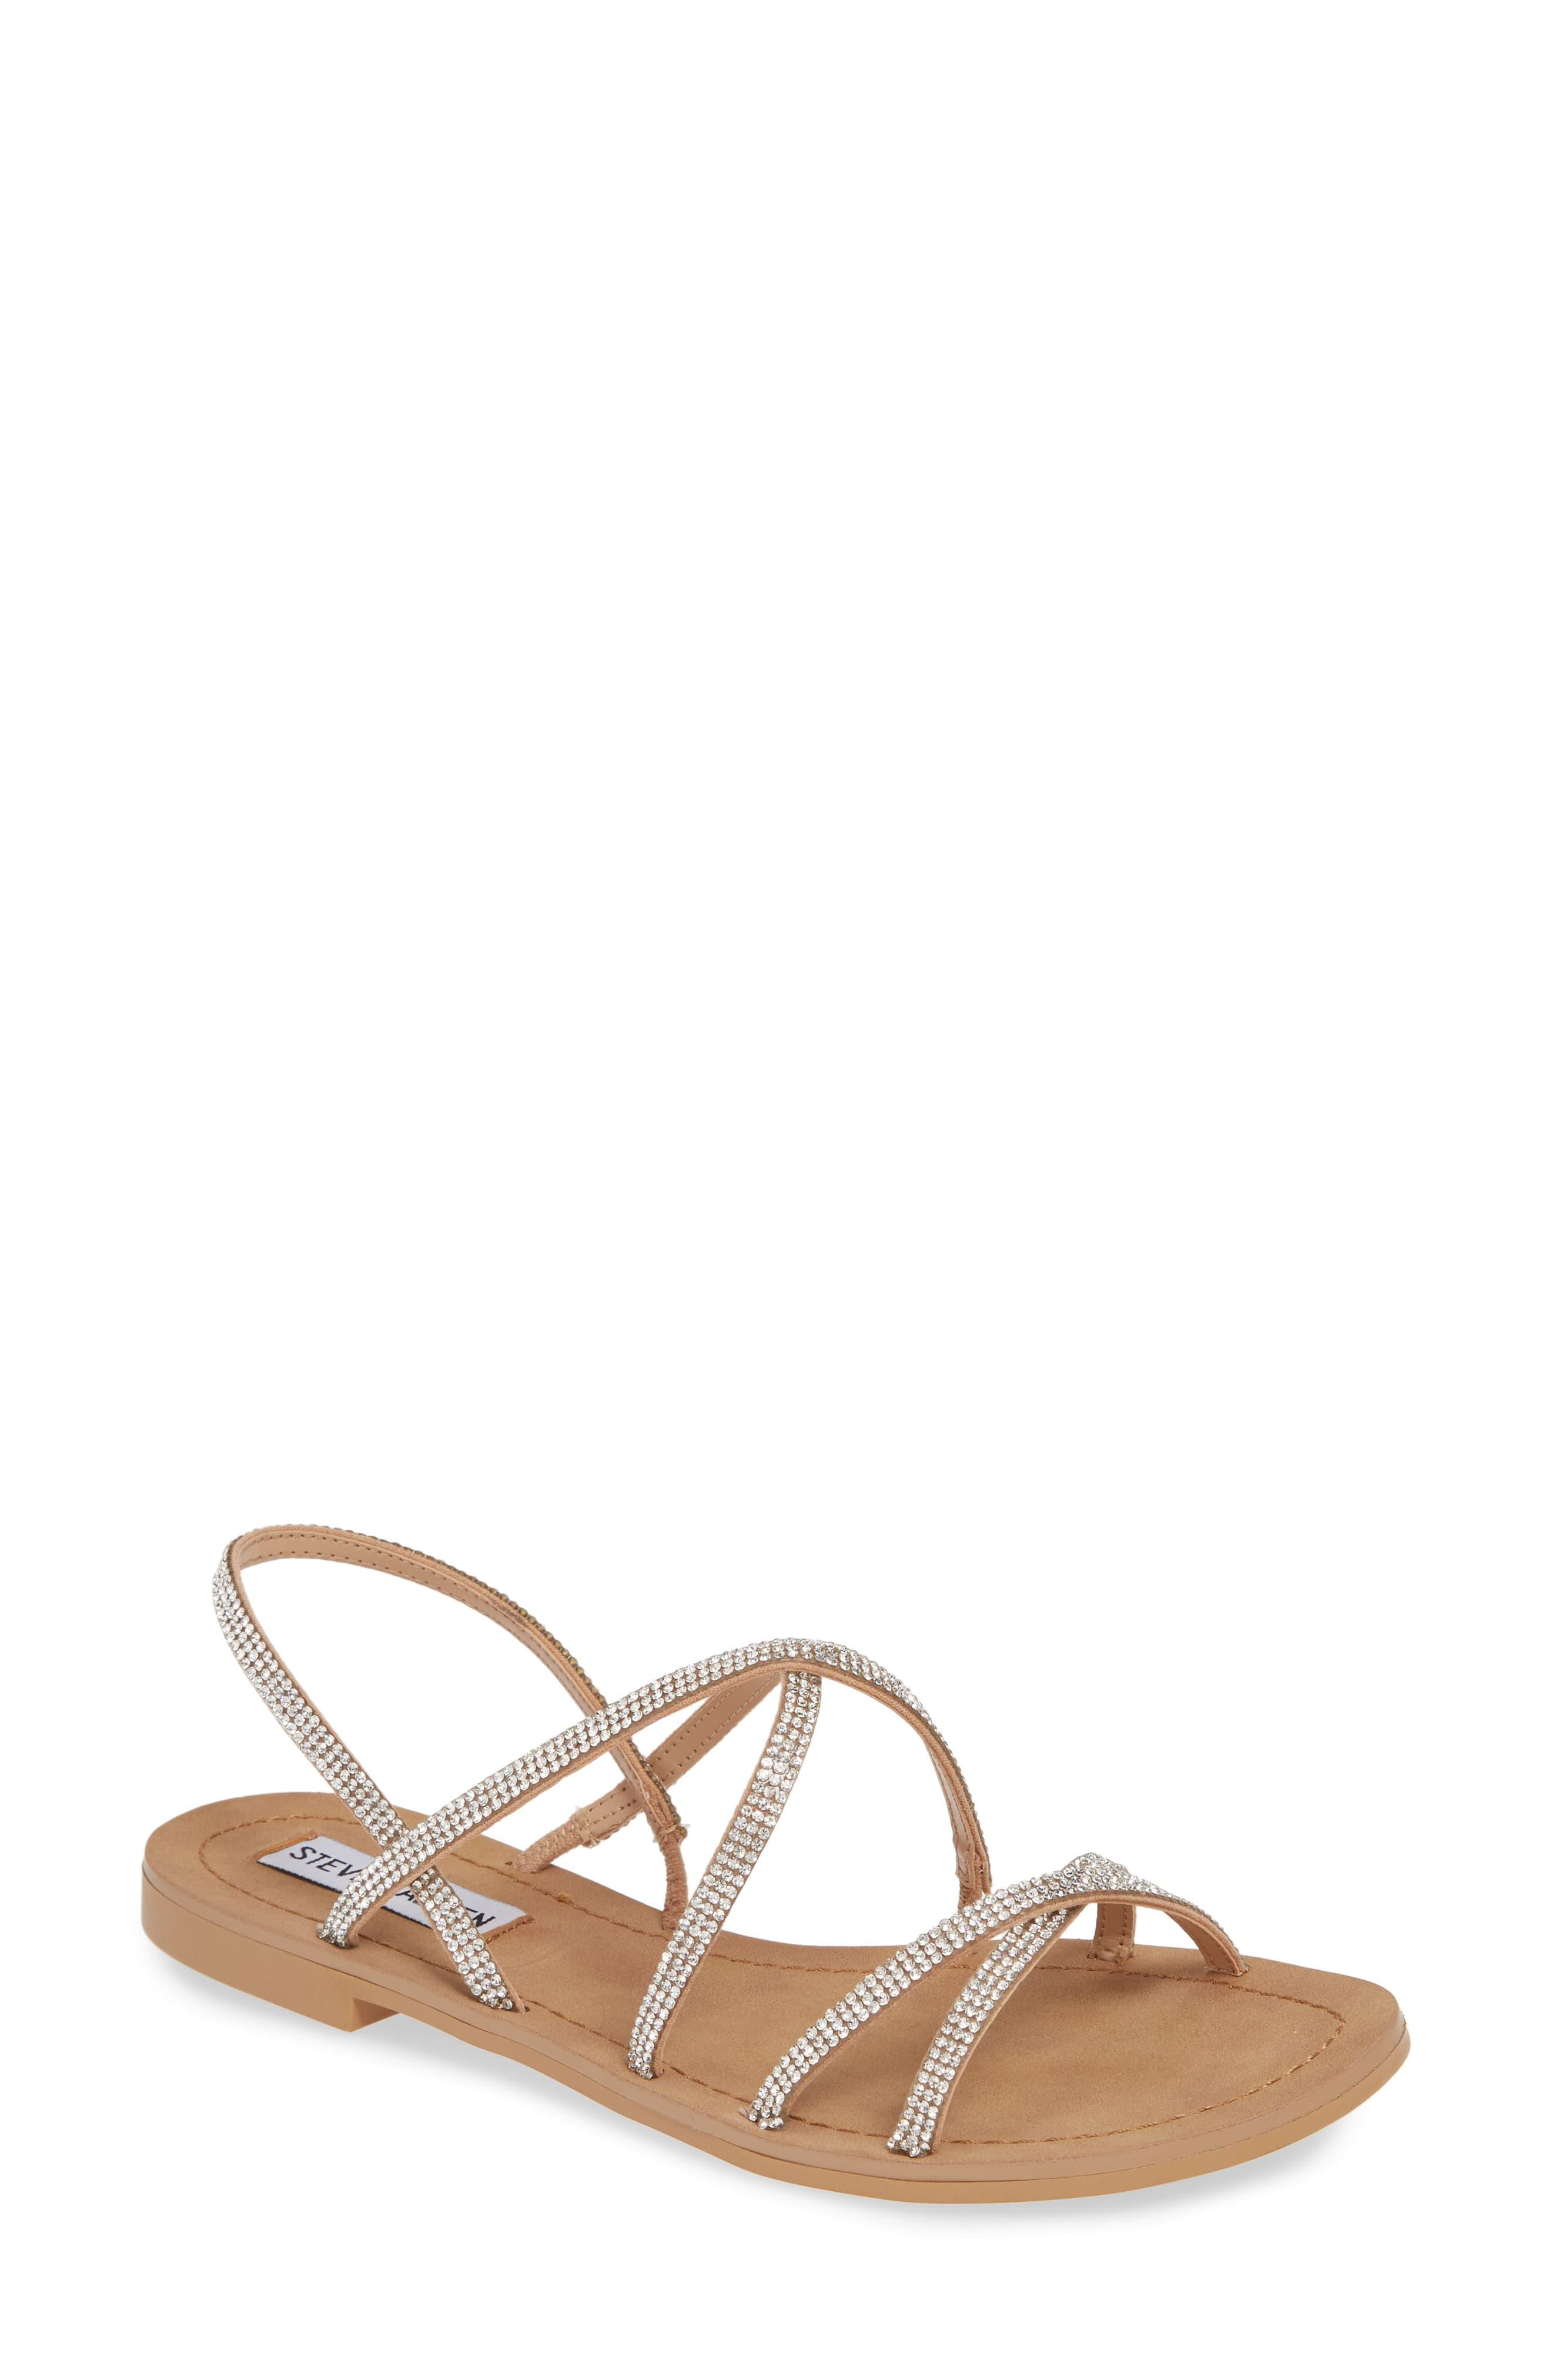 5717b1ee44b Women's Rita Embellished Strappy Sandal